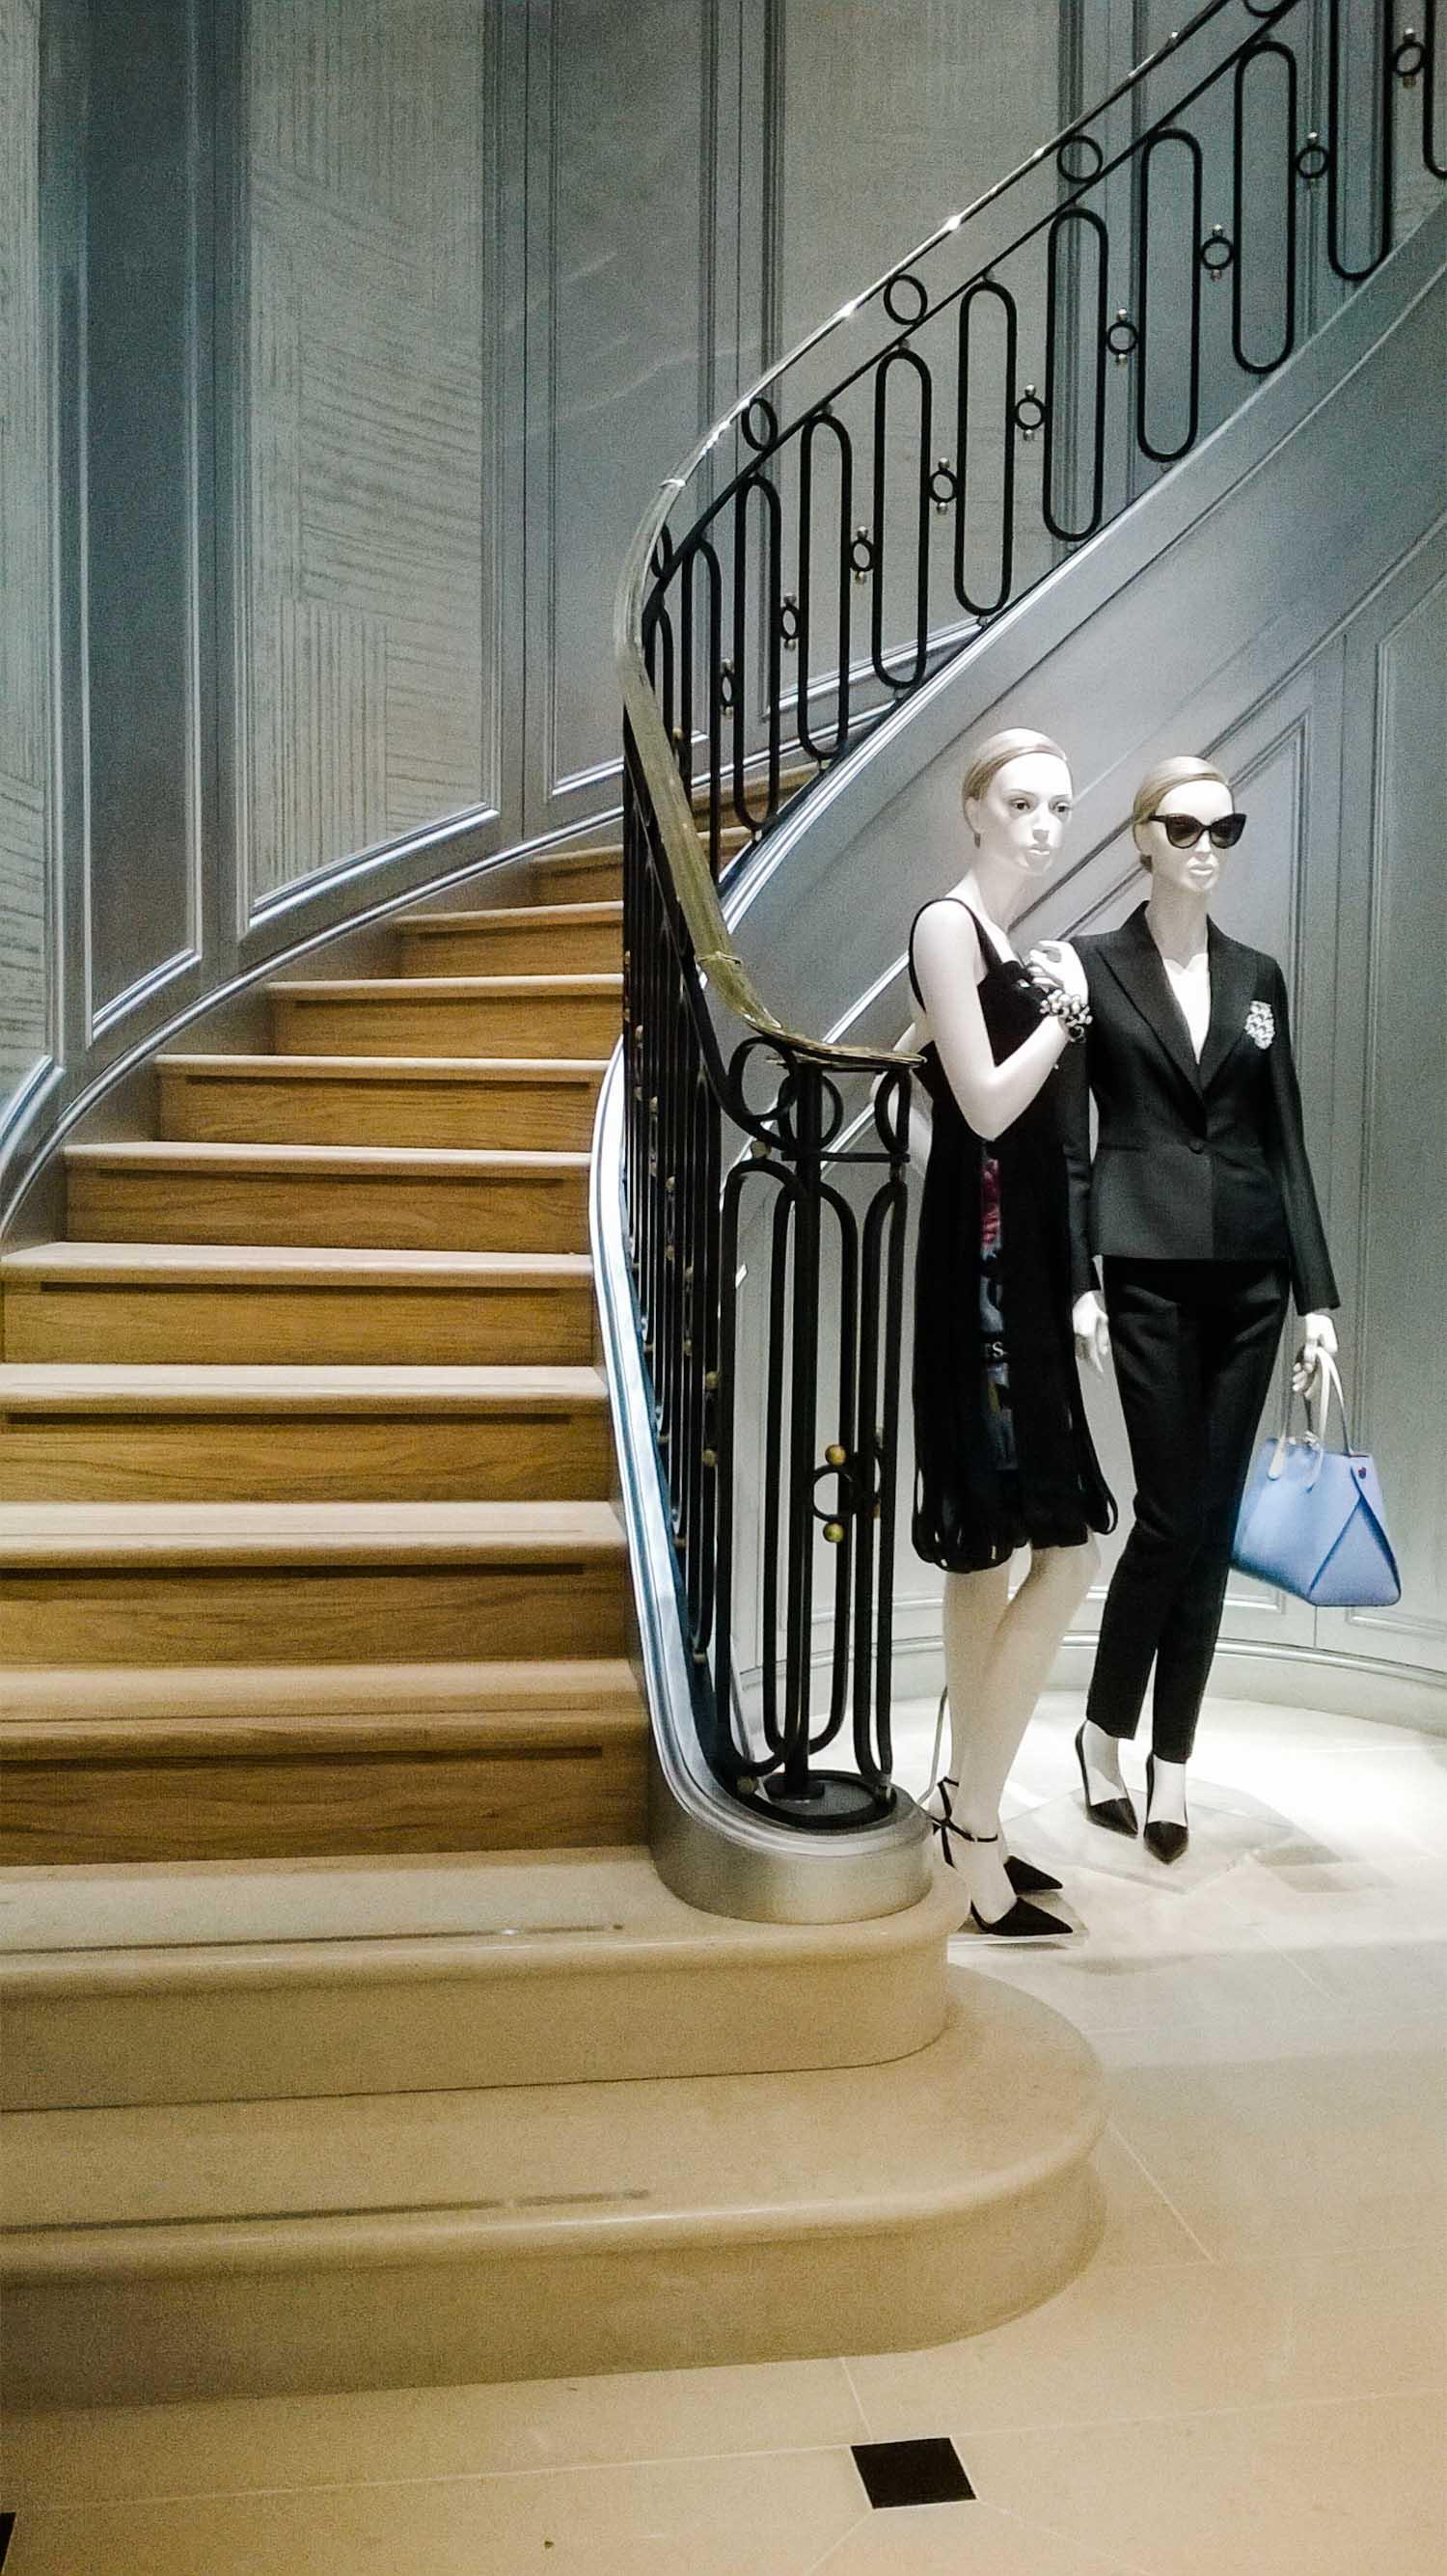 Dior Conduit St Metal Balustrades